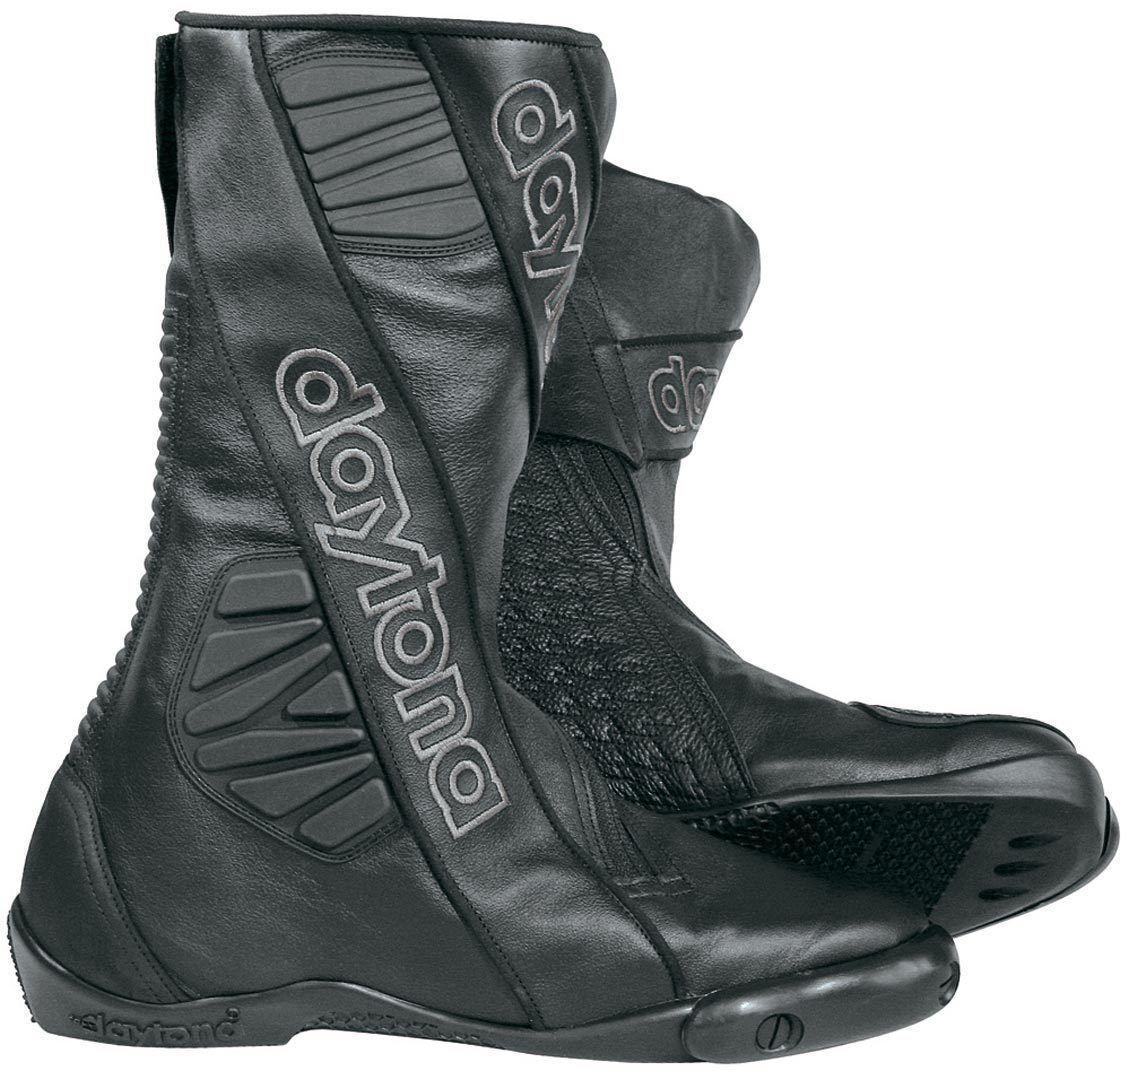 Daytona Security Evo G3 Motorcycle Boots  - Size: 47